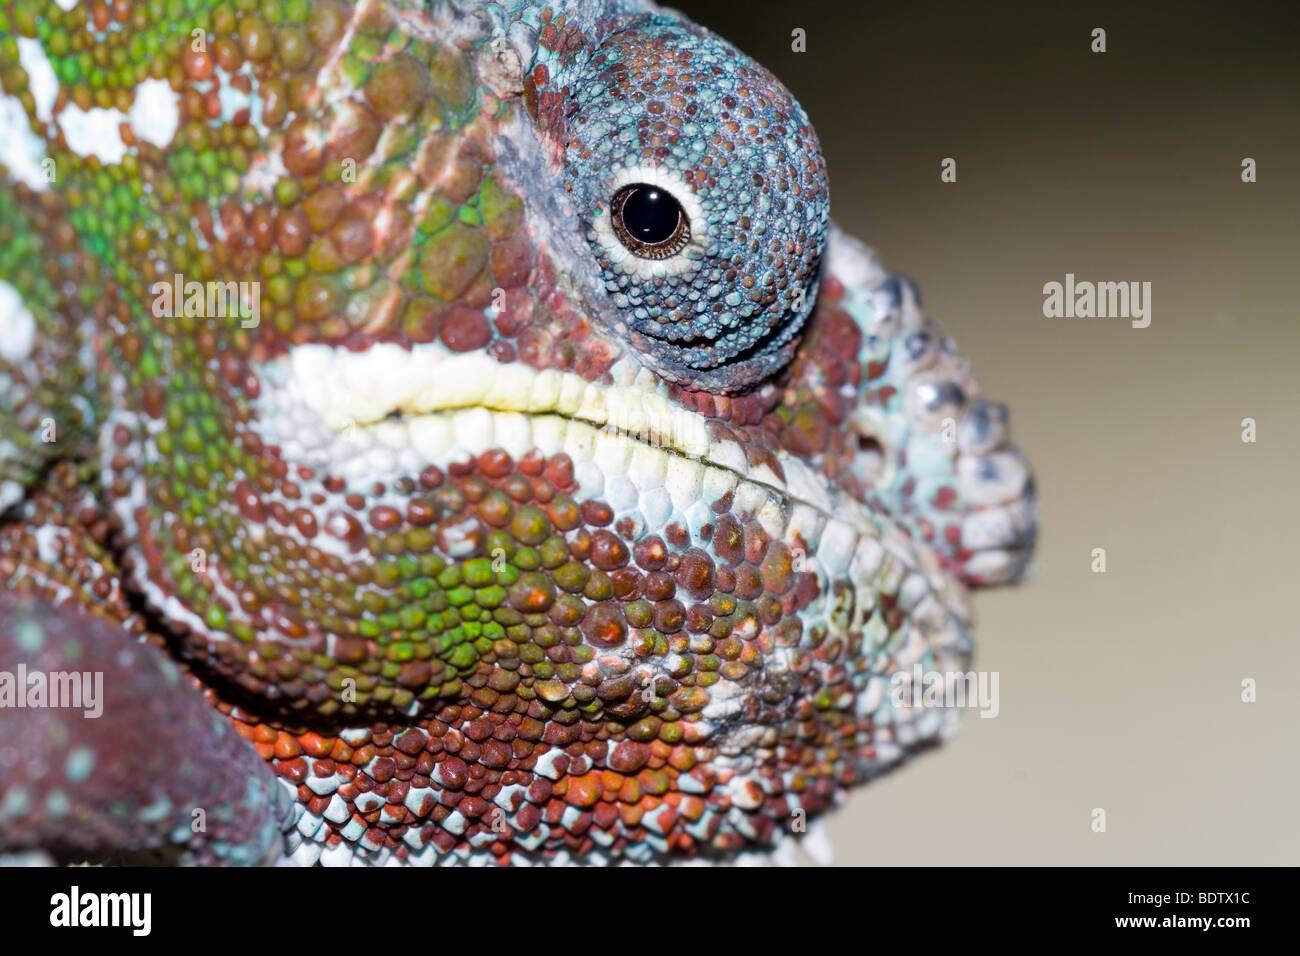 Pantherchamaeleon, maennlich, maennchen, male, Furcifer pardalis, panther chameleon, madagascar, africa, Madagaskar, - Stock Image